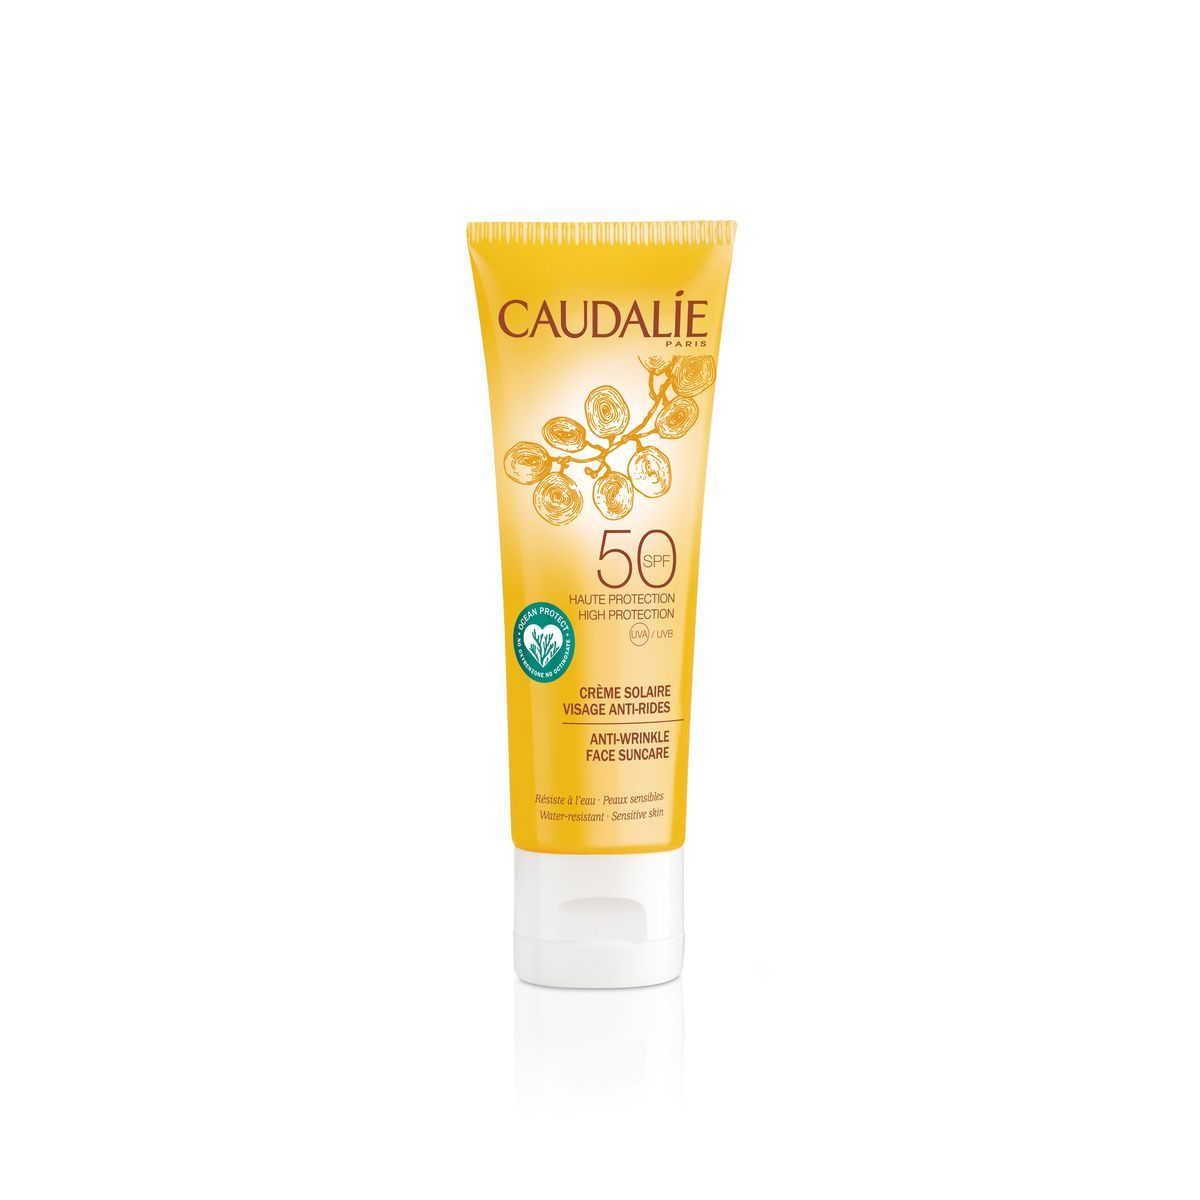 Caudalie Anti-wrinkle Face Suncare SPF 50 50ml